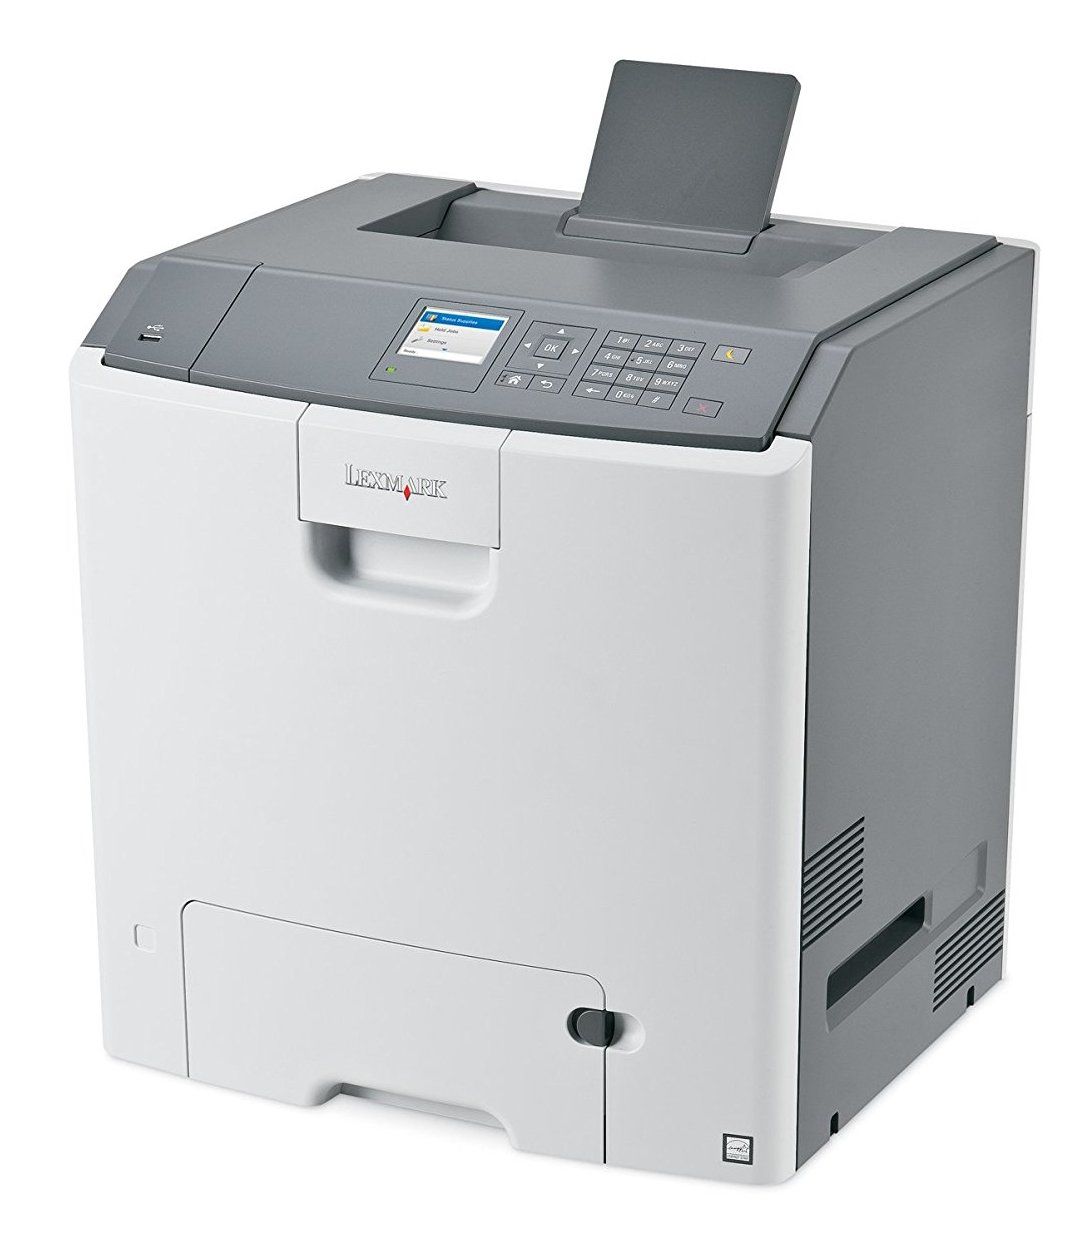 Lexmark C748dte Printer